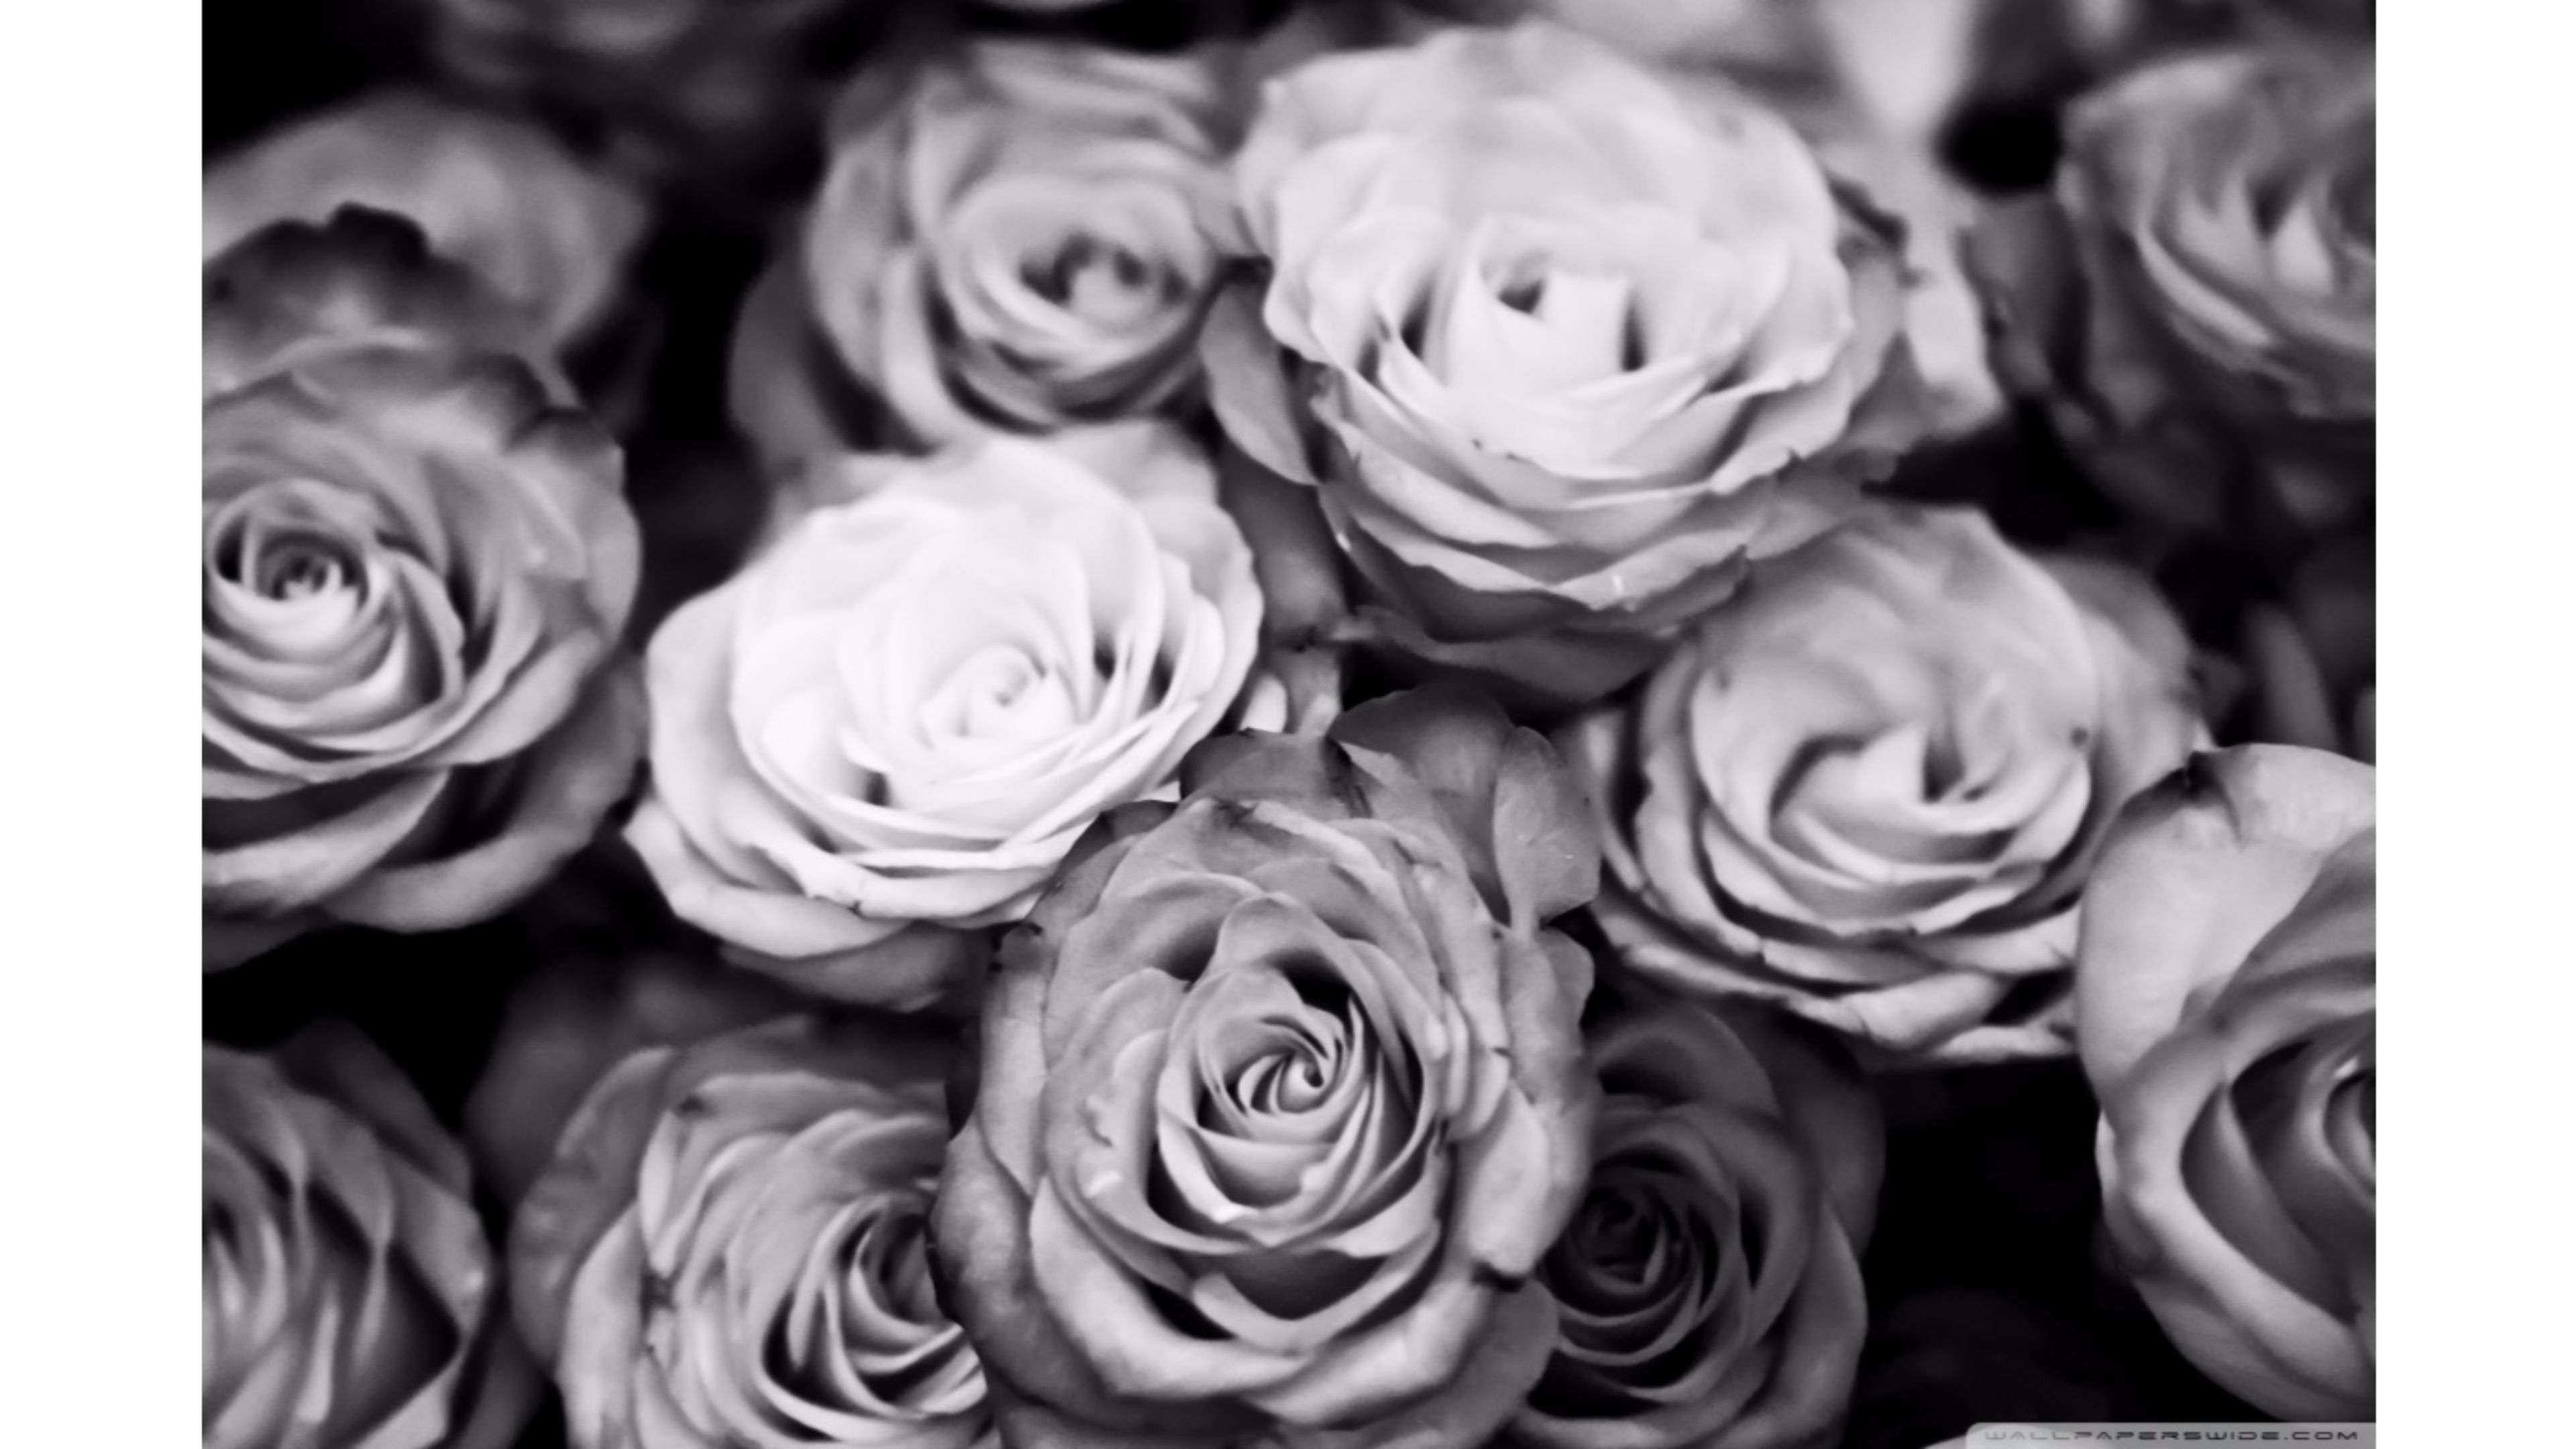 Free Download Black And White Roses Wallpaper 4k 4k